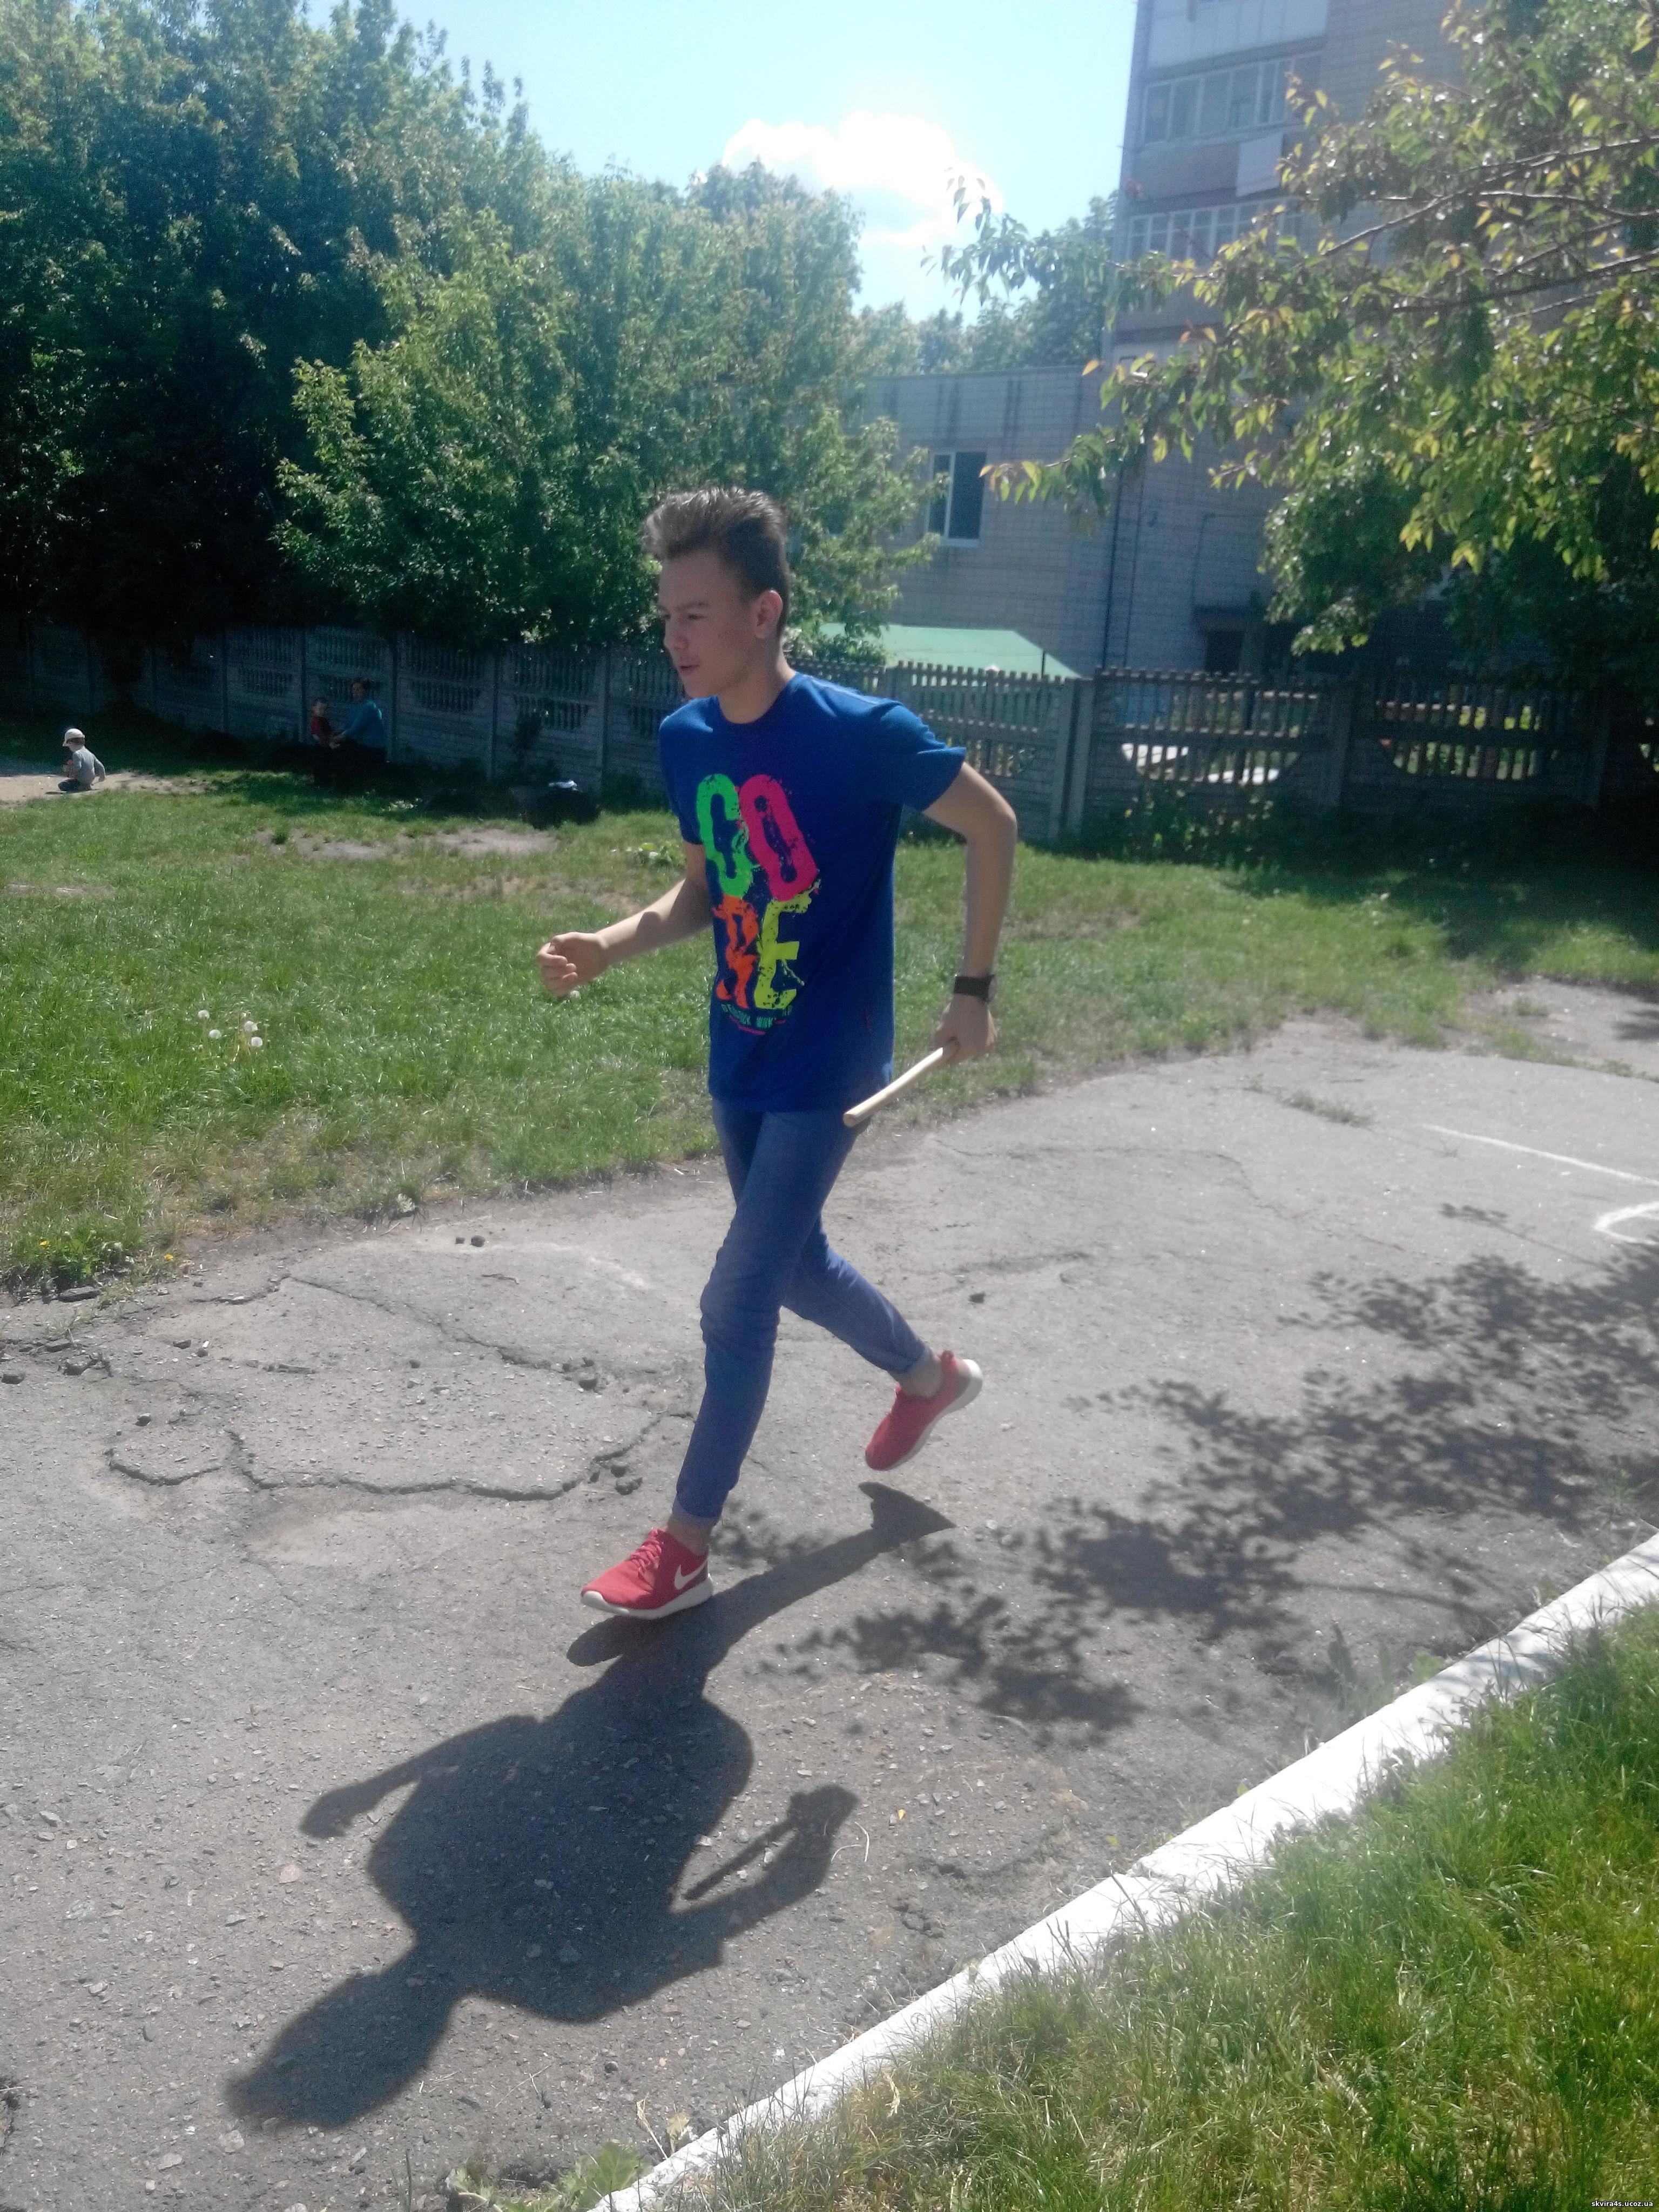 http://skvira4s.ucoz.ua/foto/24-05-17-1/2017524111820.jpg